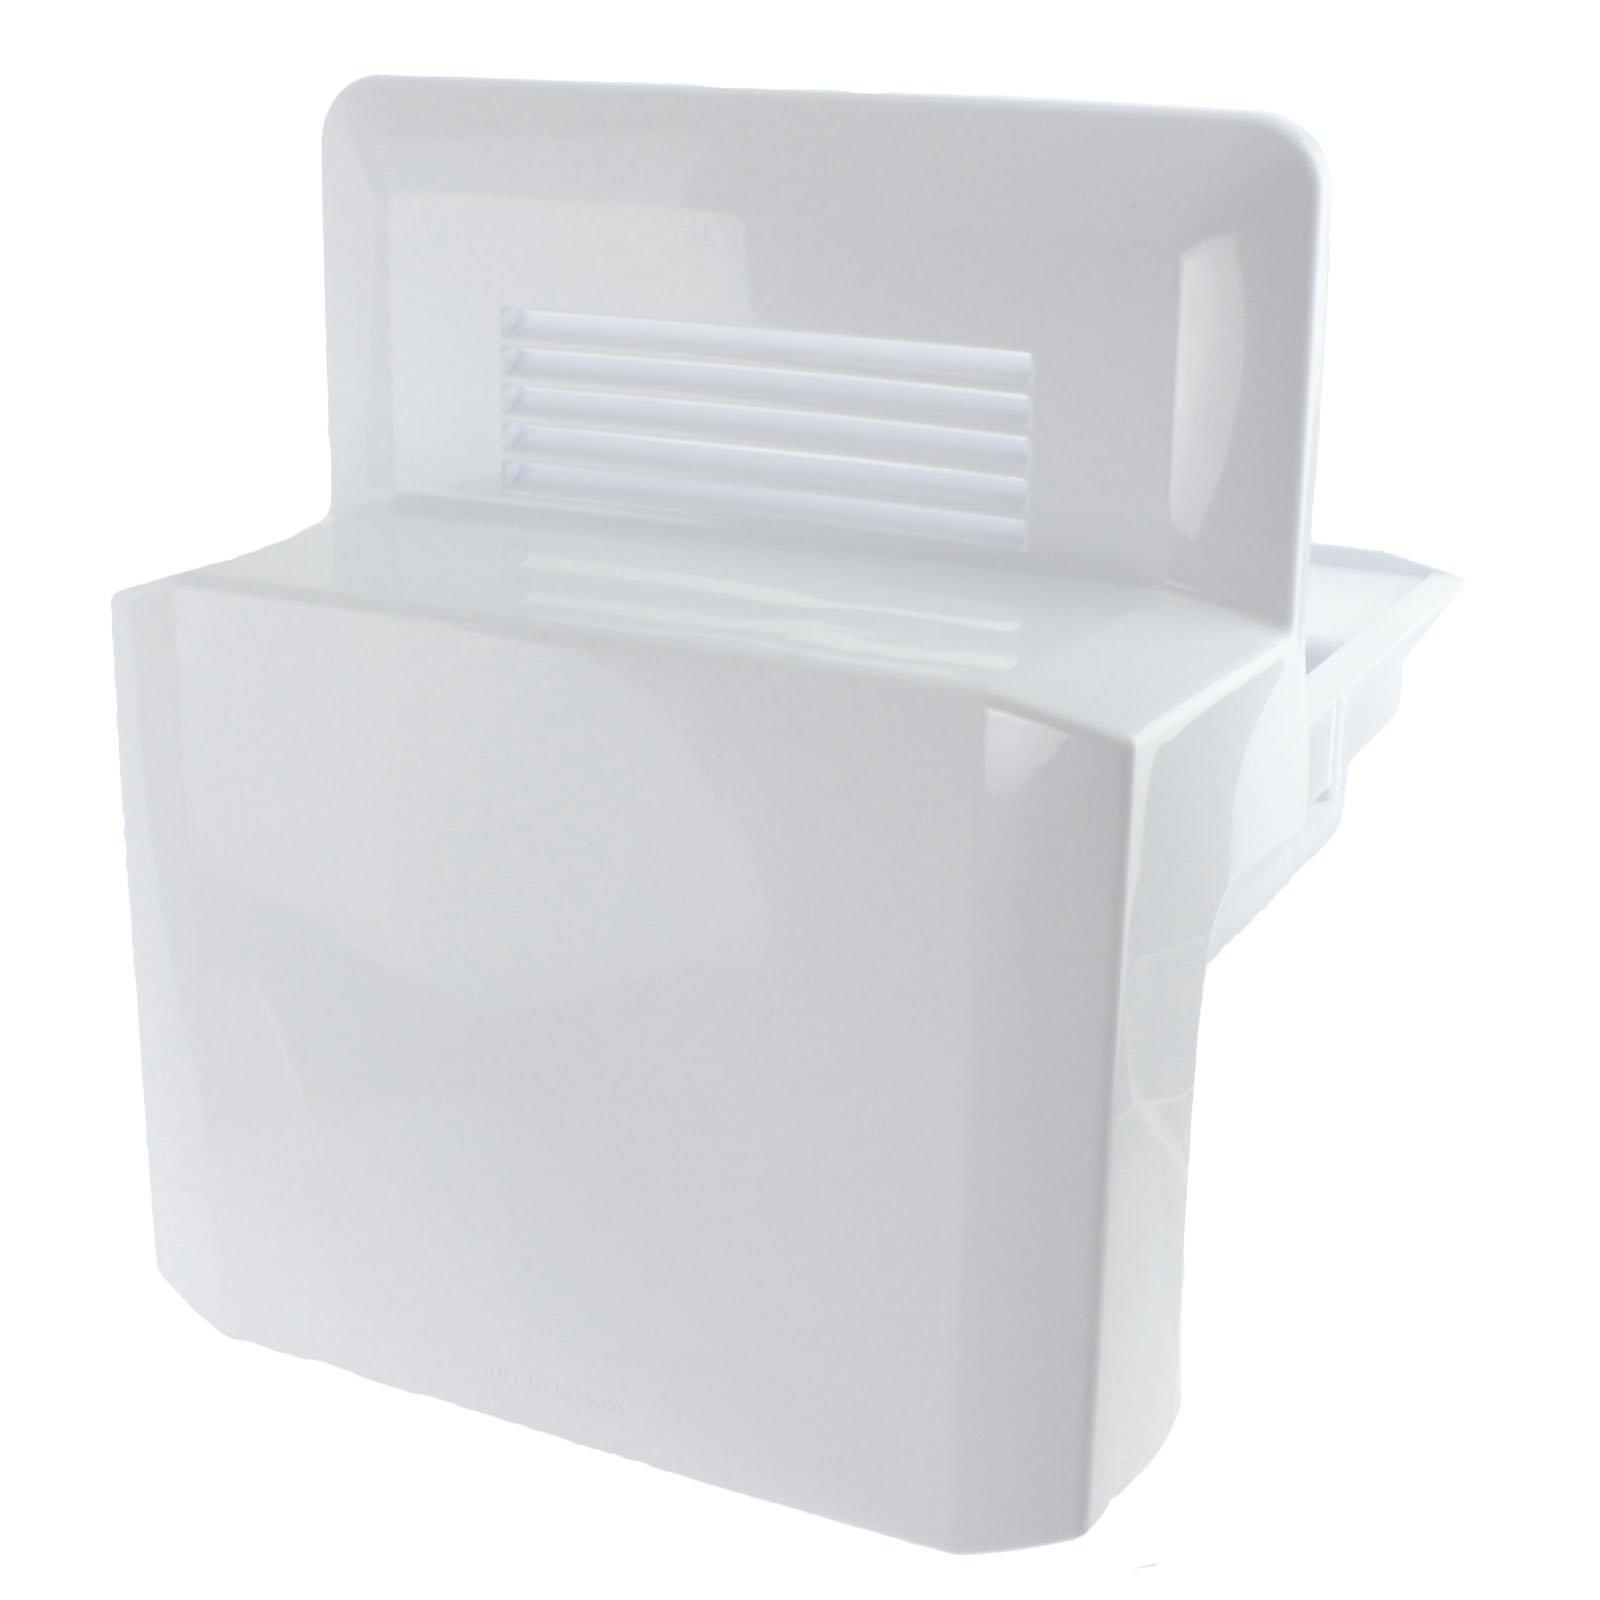 Samsung Genuine Fridge Freezer Ice Maker Bucket